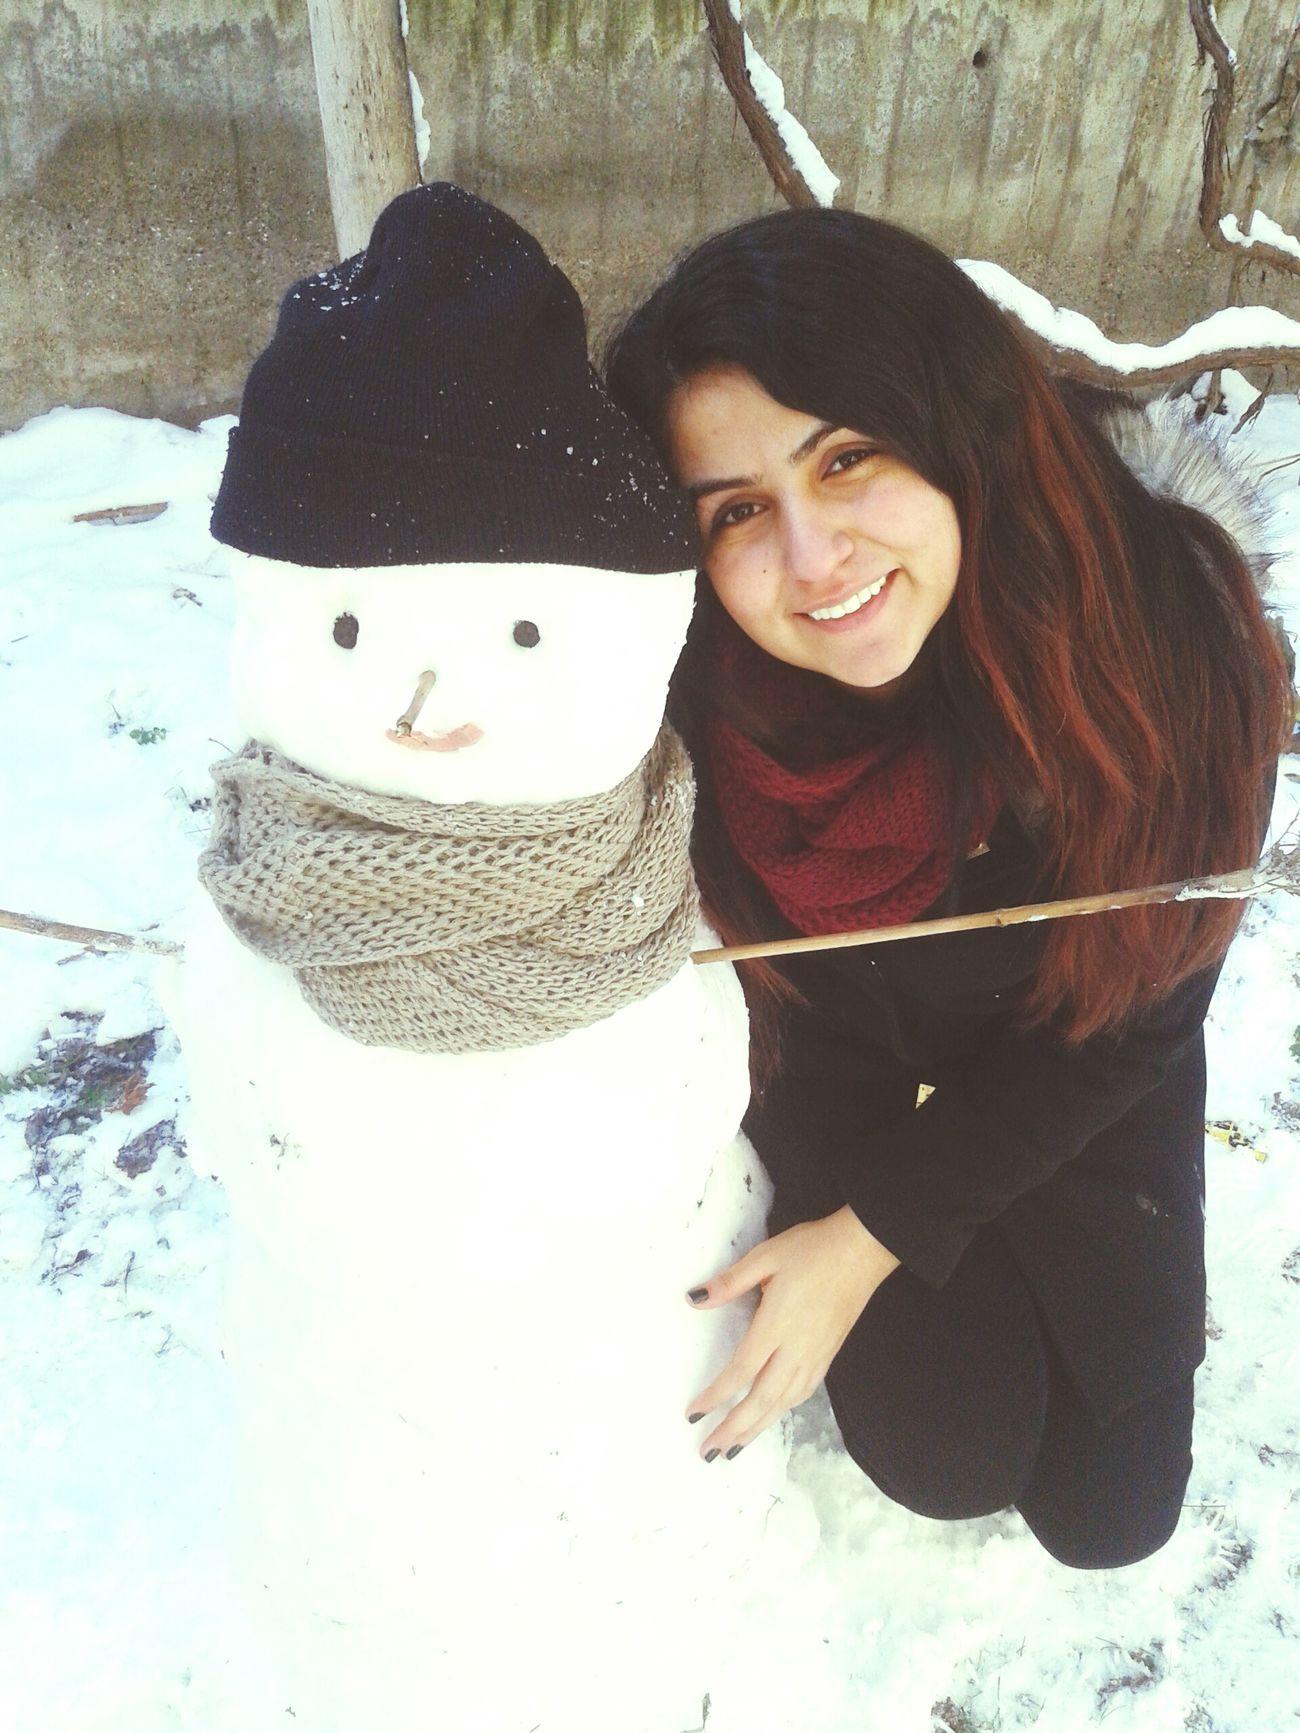 Snowman First Eyeem Photo